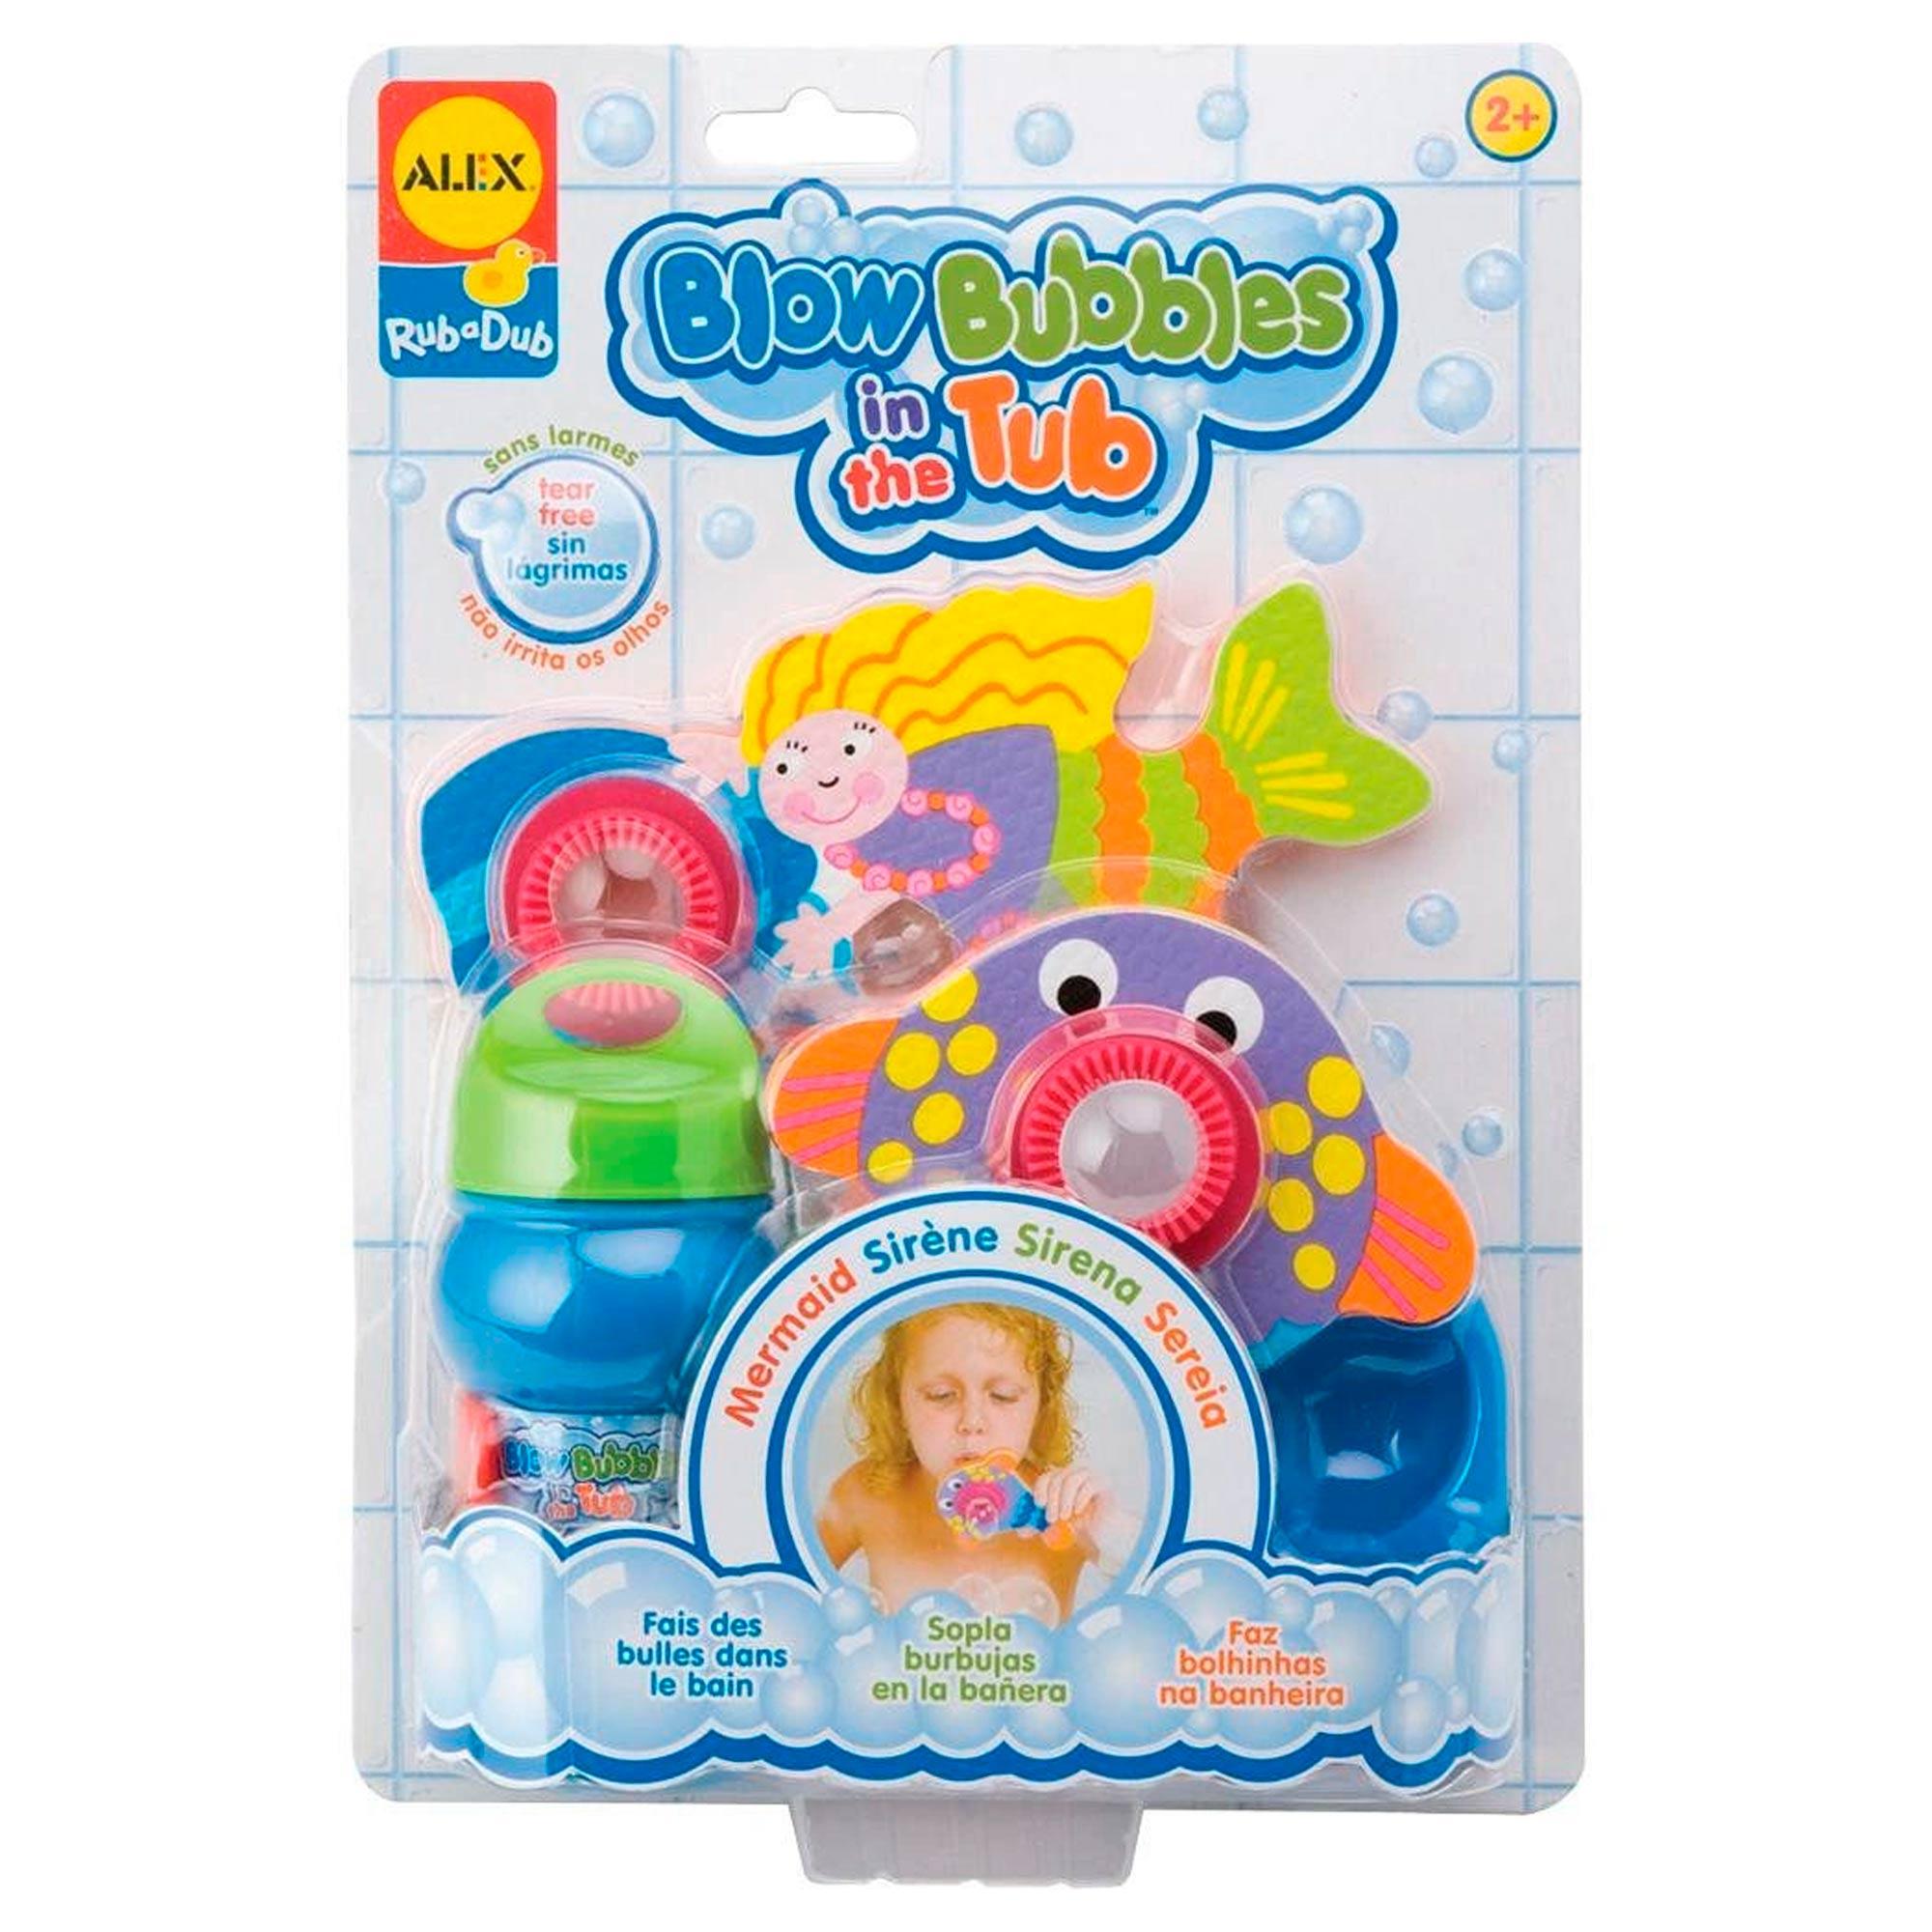 Brinquedos Para Banheira Sereia - Blow Bubles In The Tub Sereia